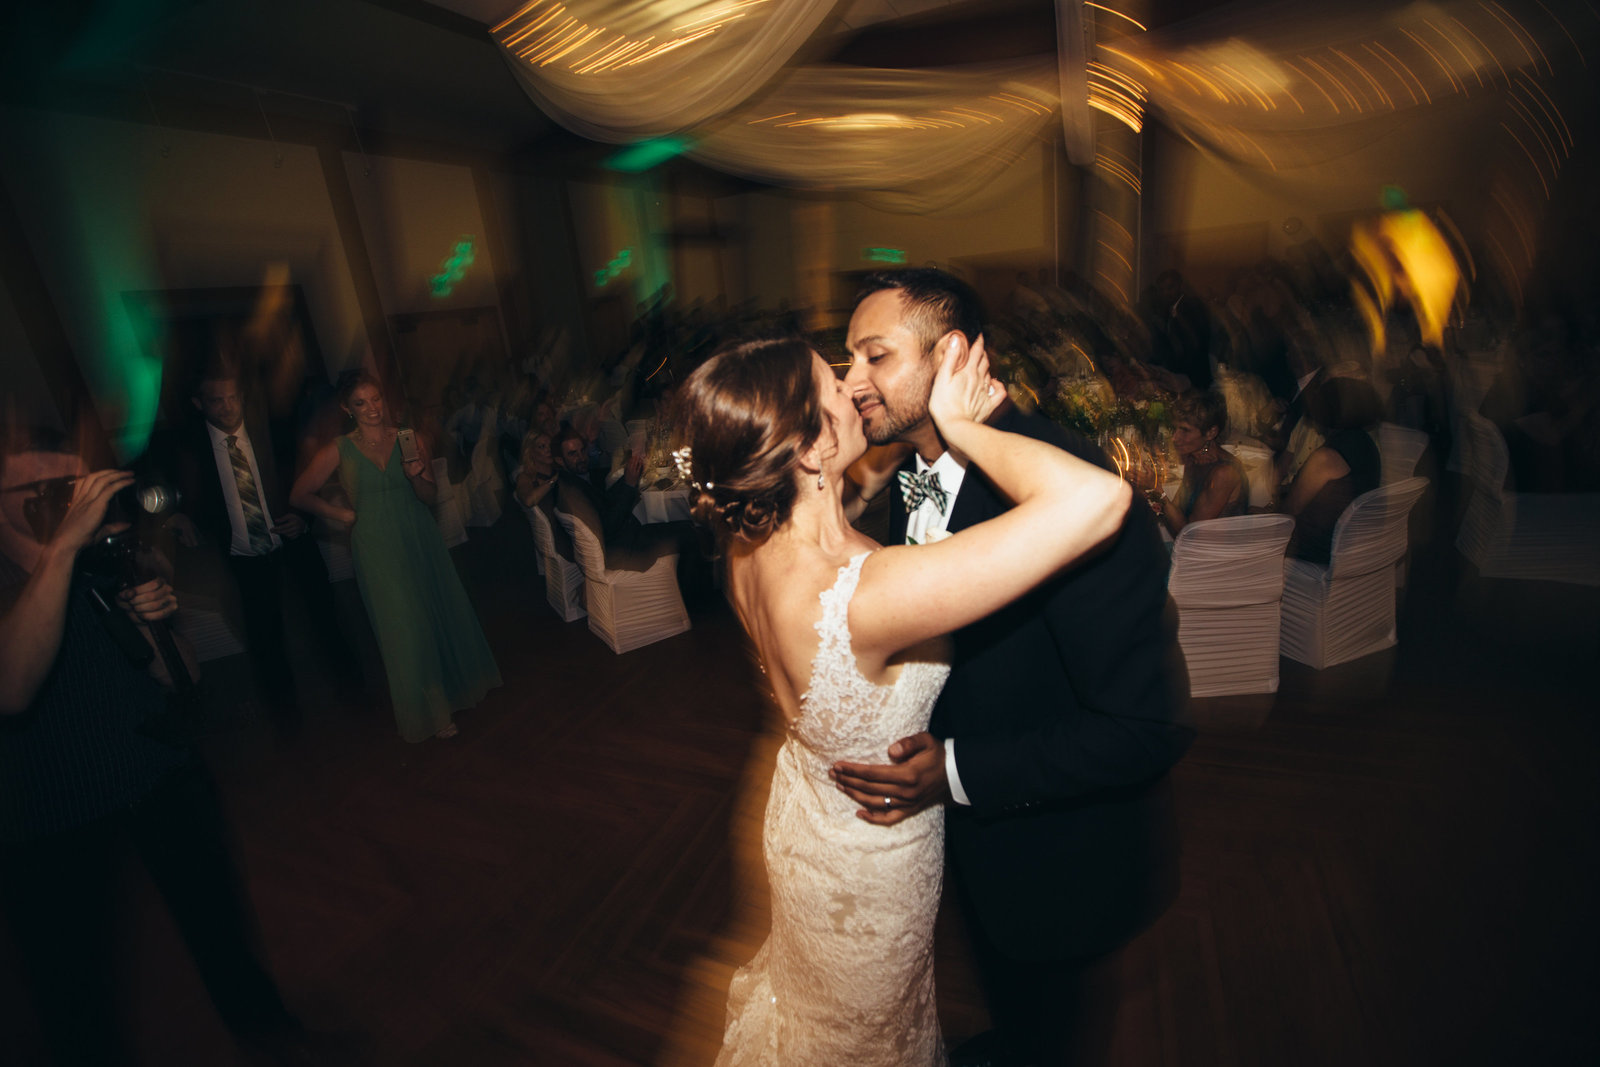 Wedding Shoppe Brian Bossany 2015 Brides-Katie Mo-0069